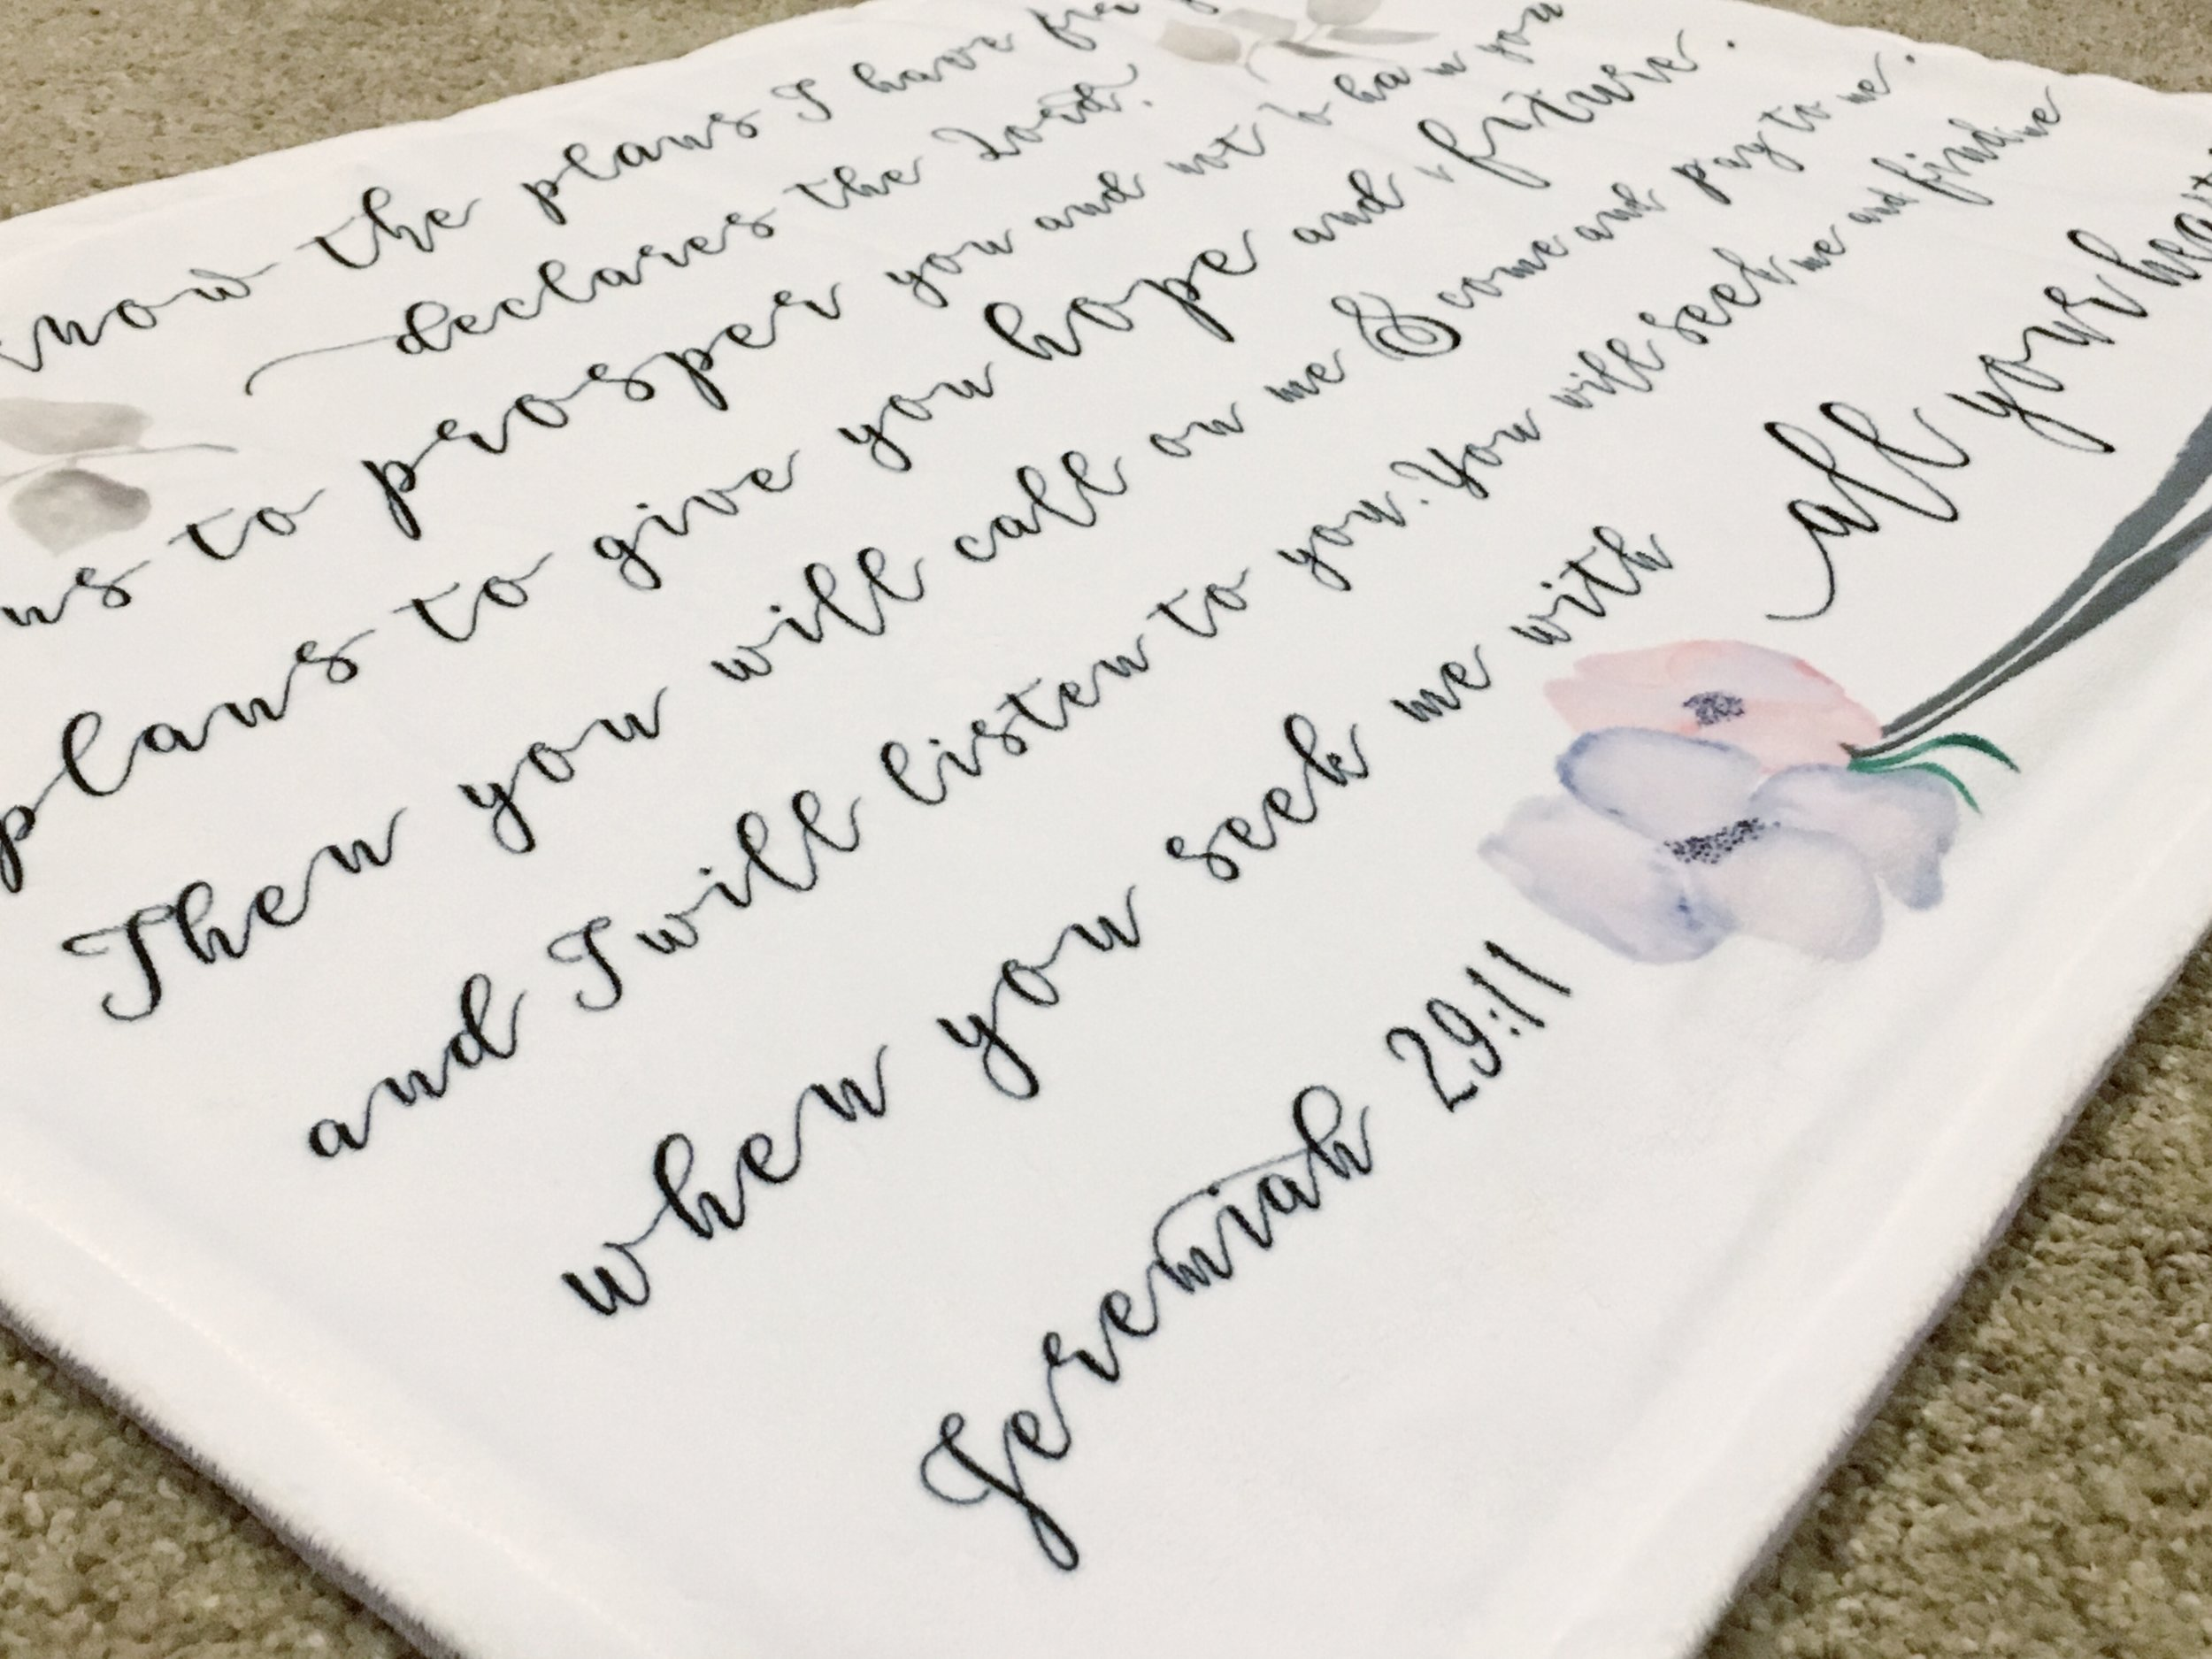 Central PA, Baby Blanket, Hand lettered, JesSmith Designs, Invitations, custom-04-15 06.23.24.jpg